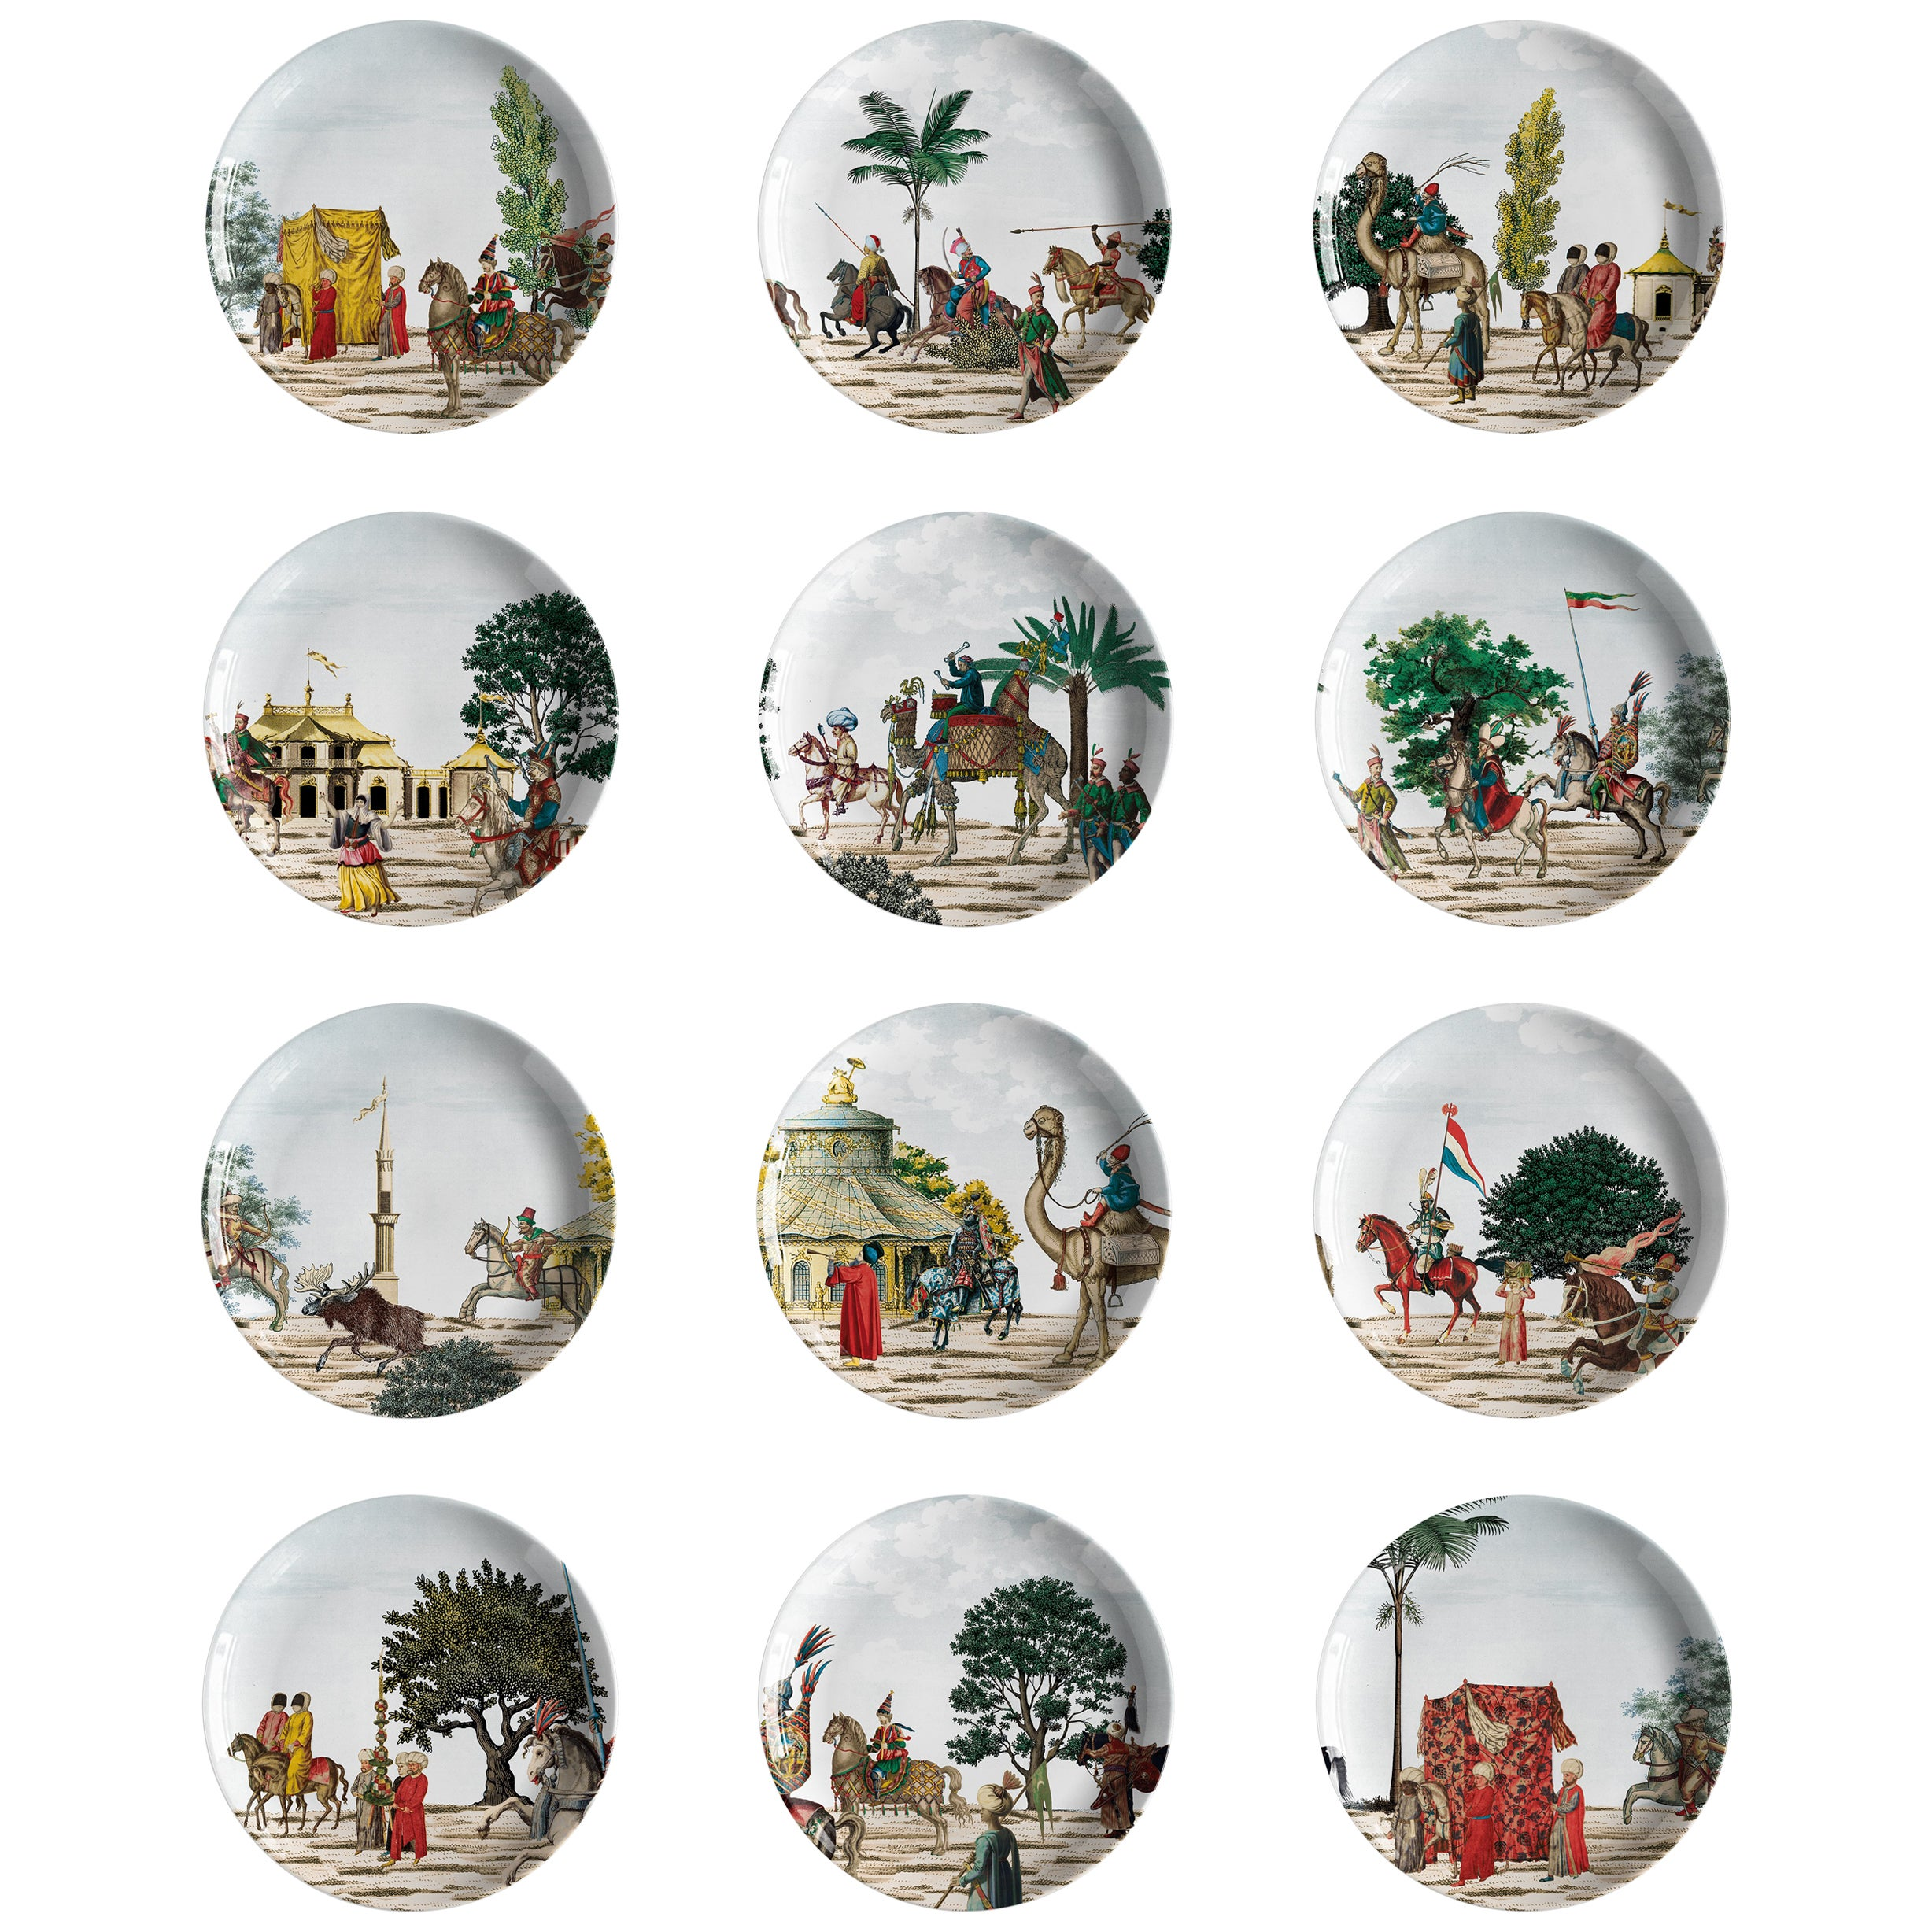 Set of 12 Corteo Porcelain Dinner Plates